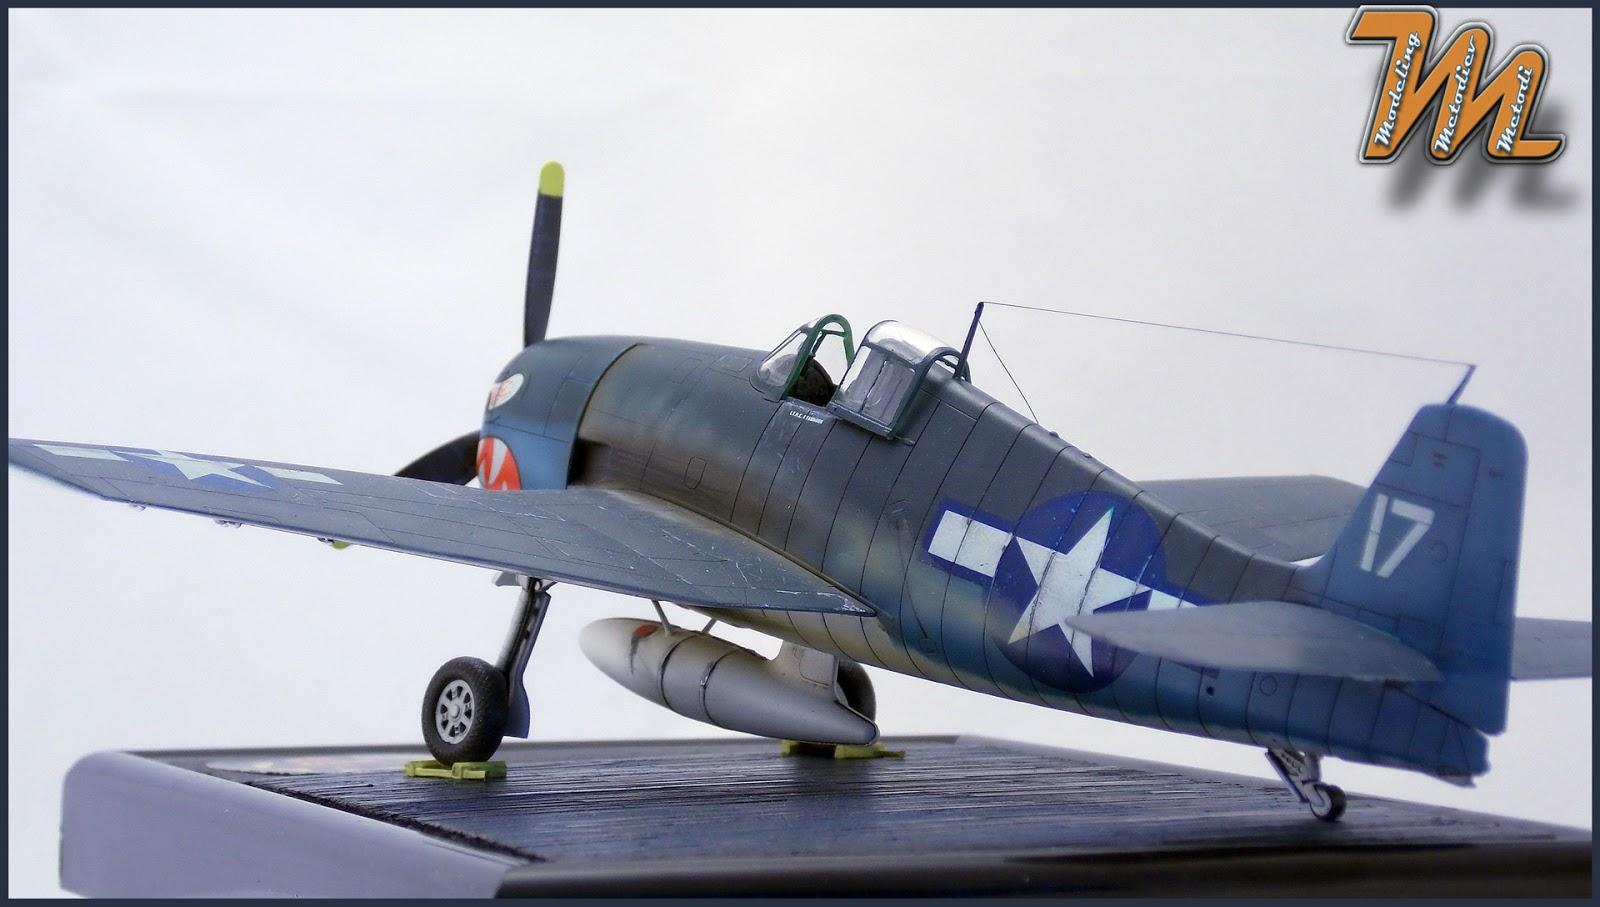 F6F-3 Hellcat, VF-27, scale model